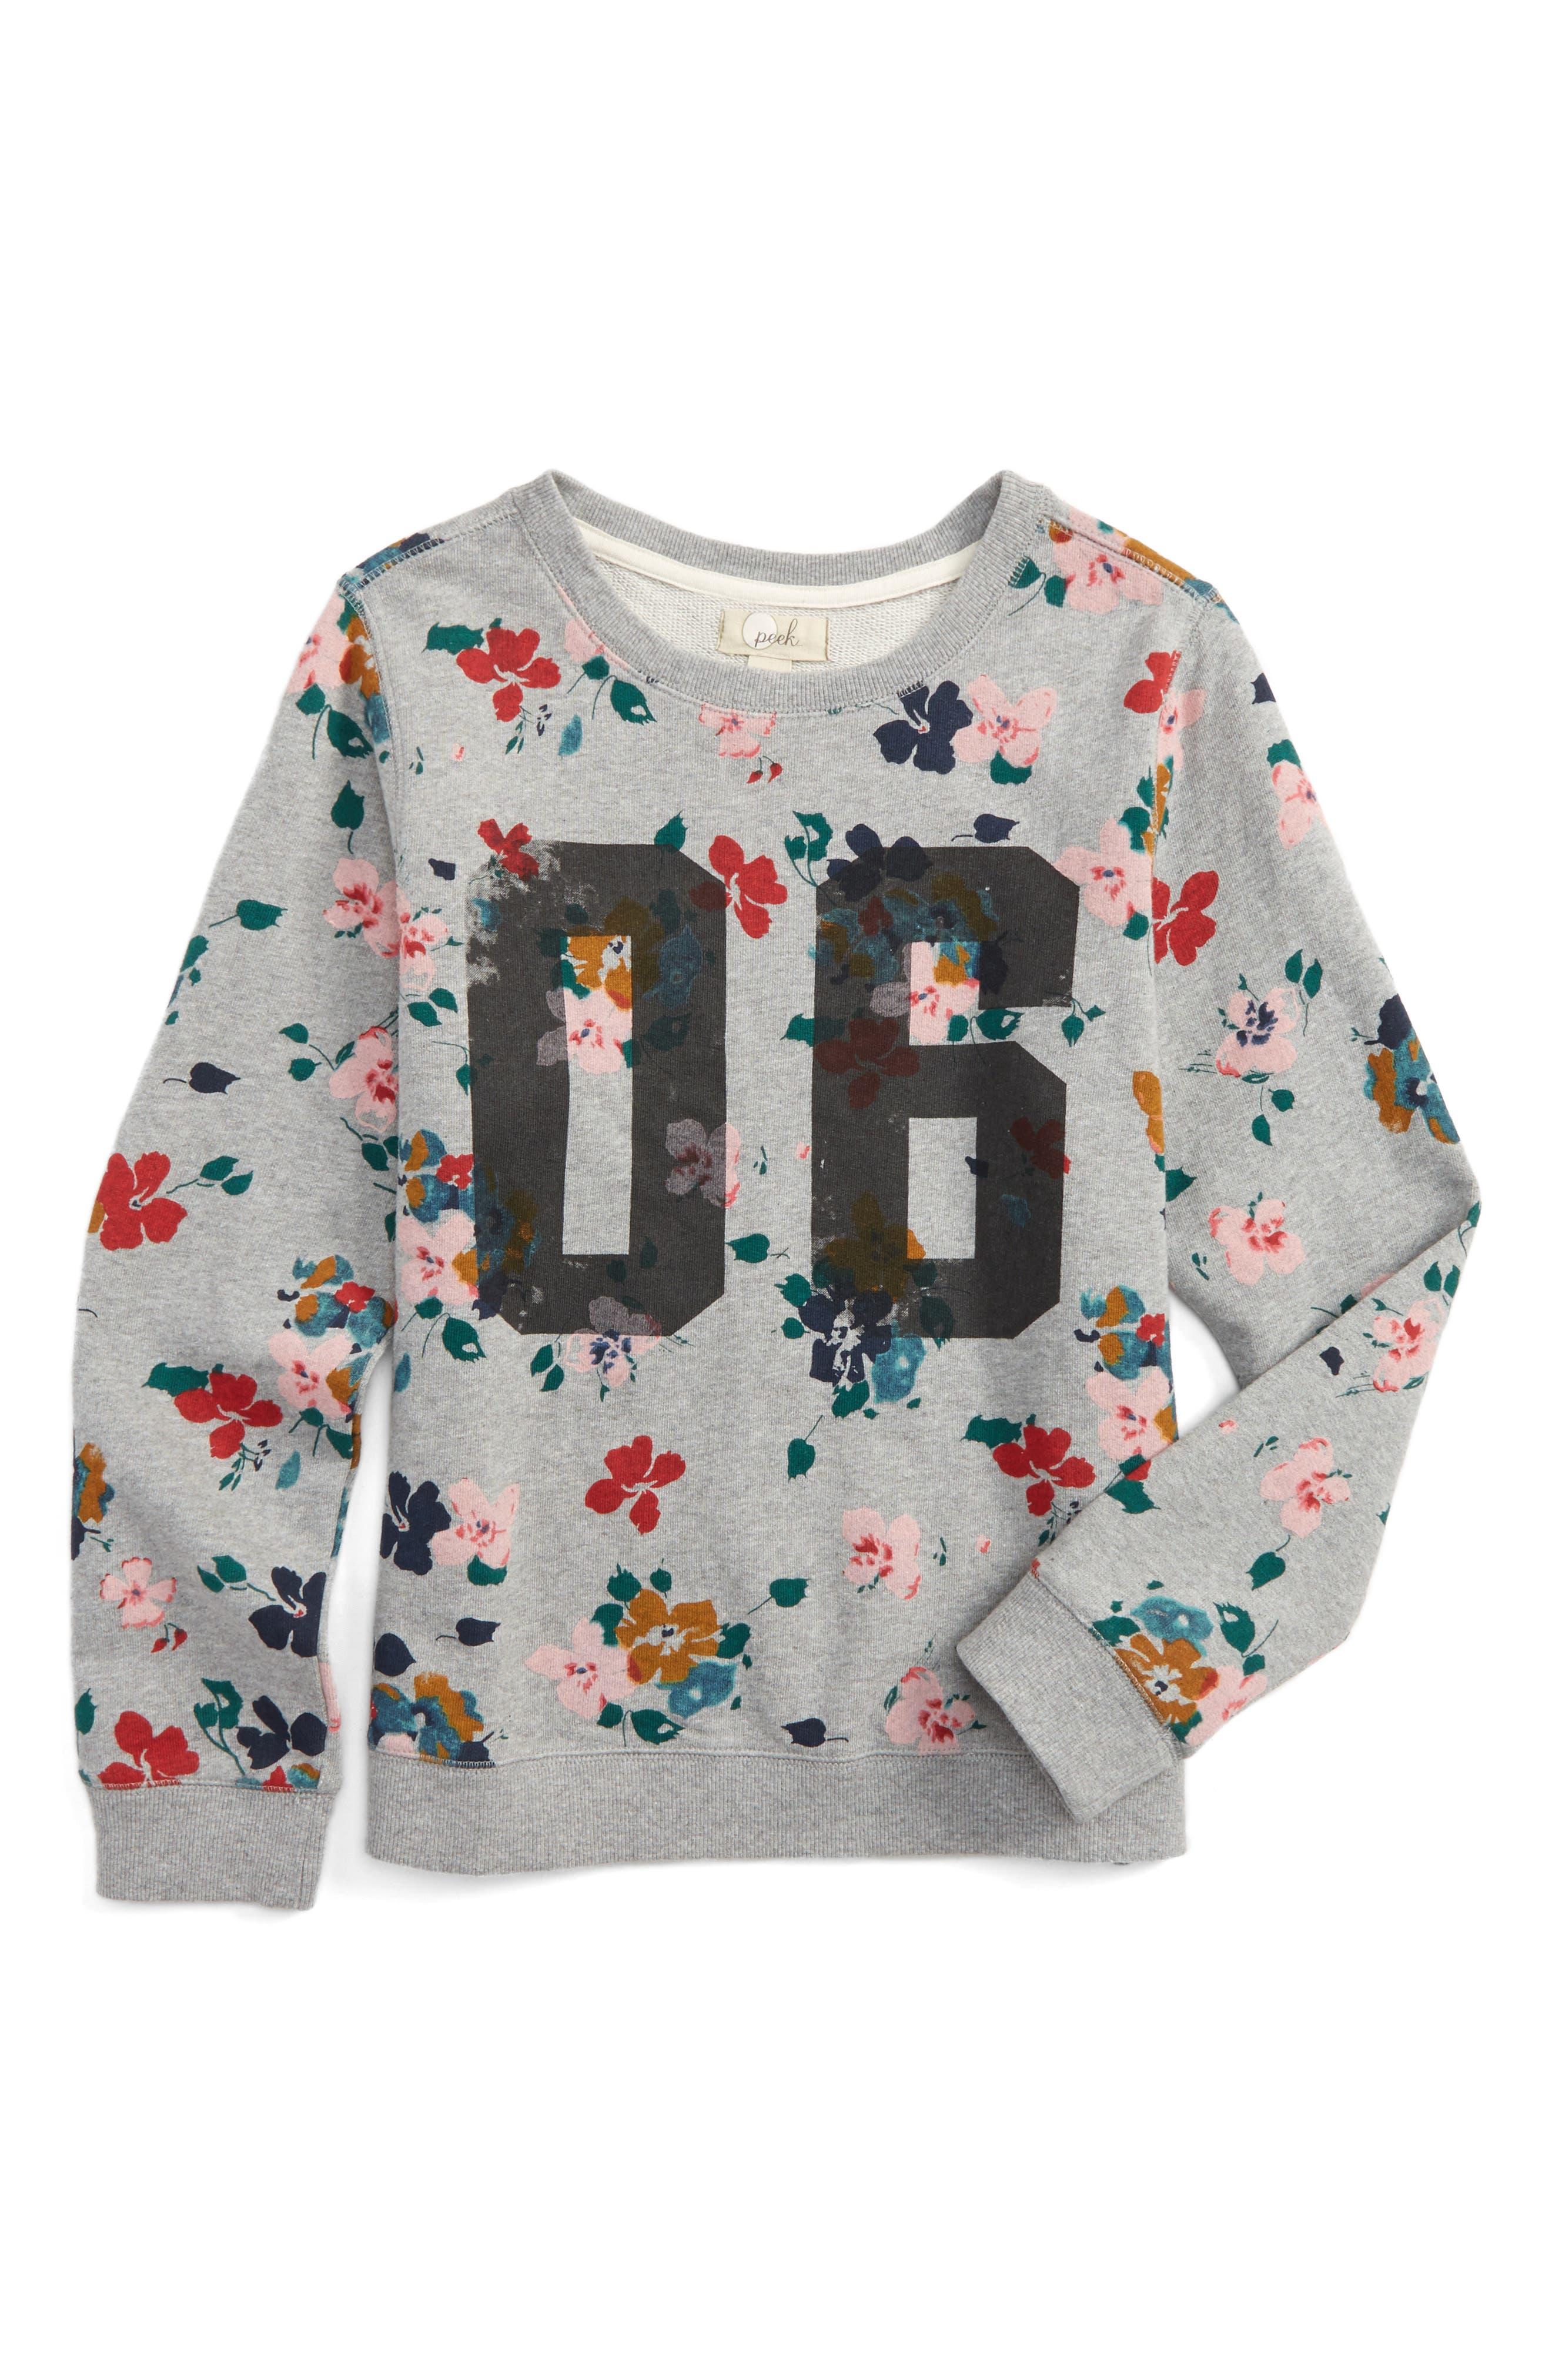 Peek Graphic Print Sweatshirt (Toddler Girls, Little Girls & Big Girls)